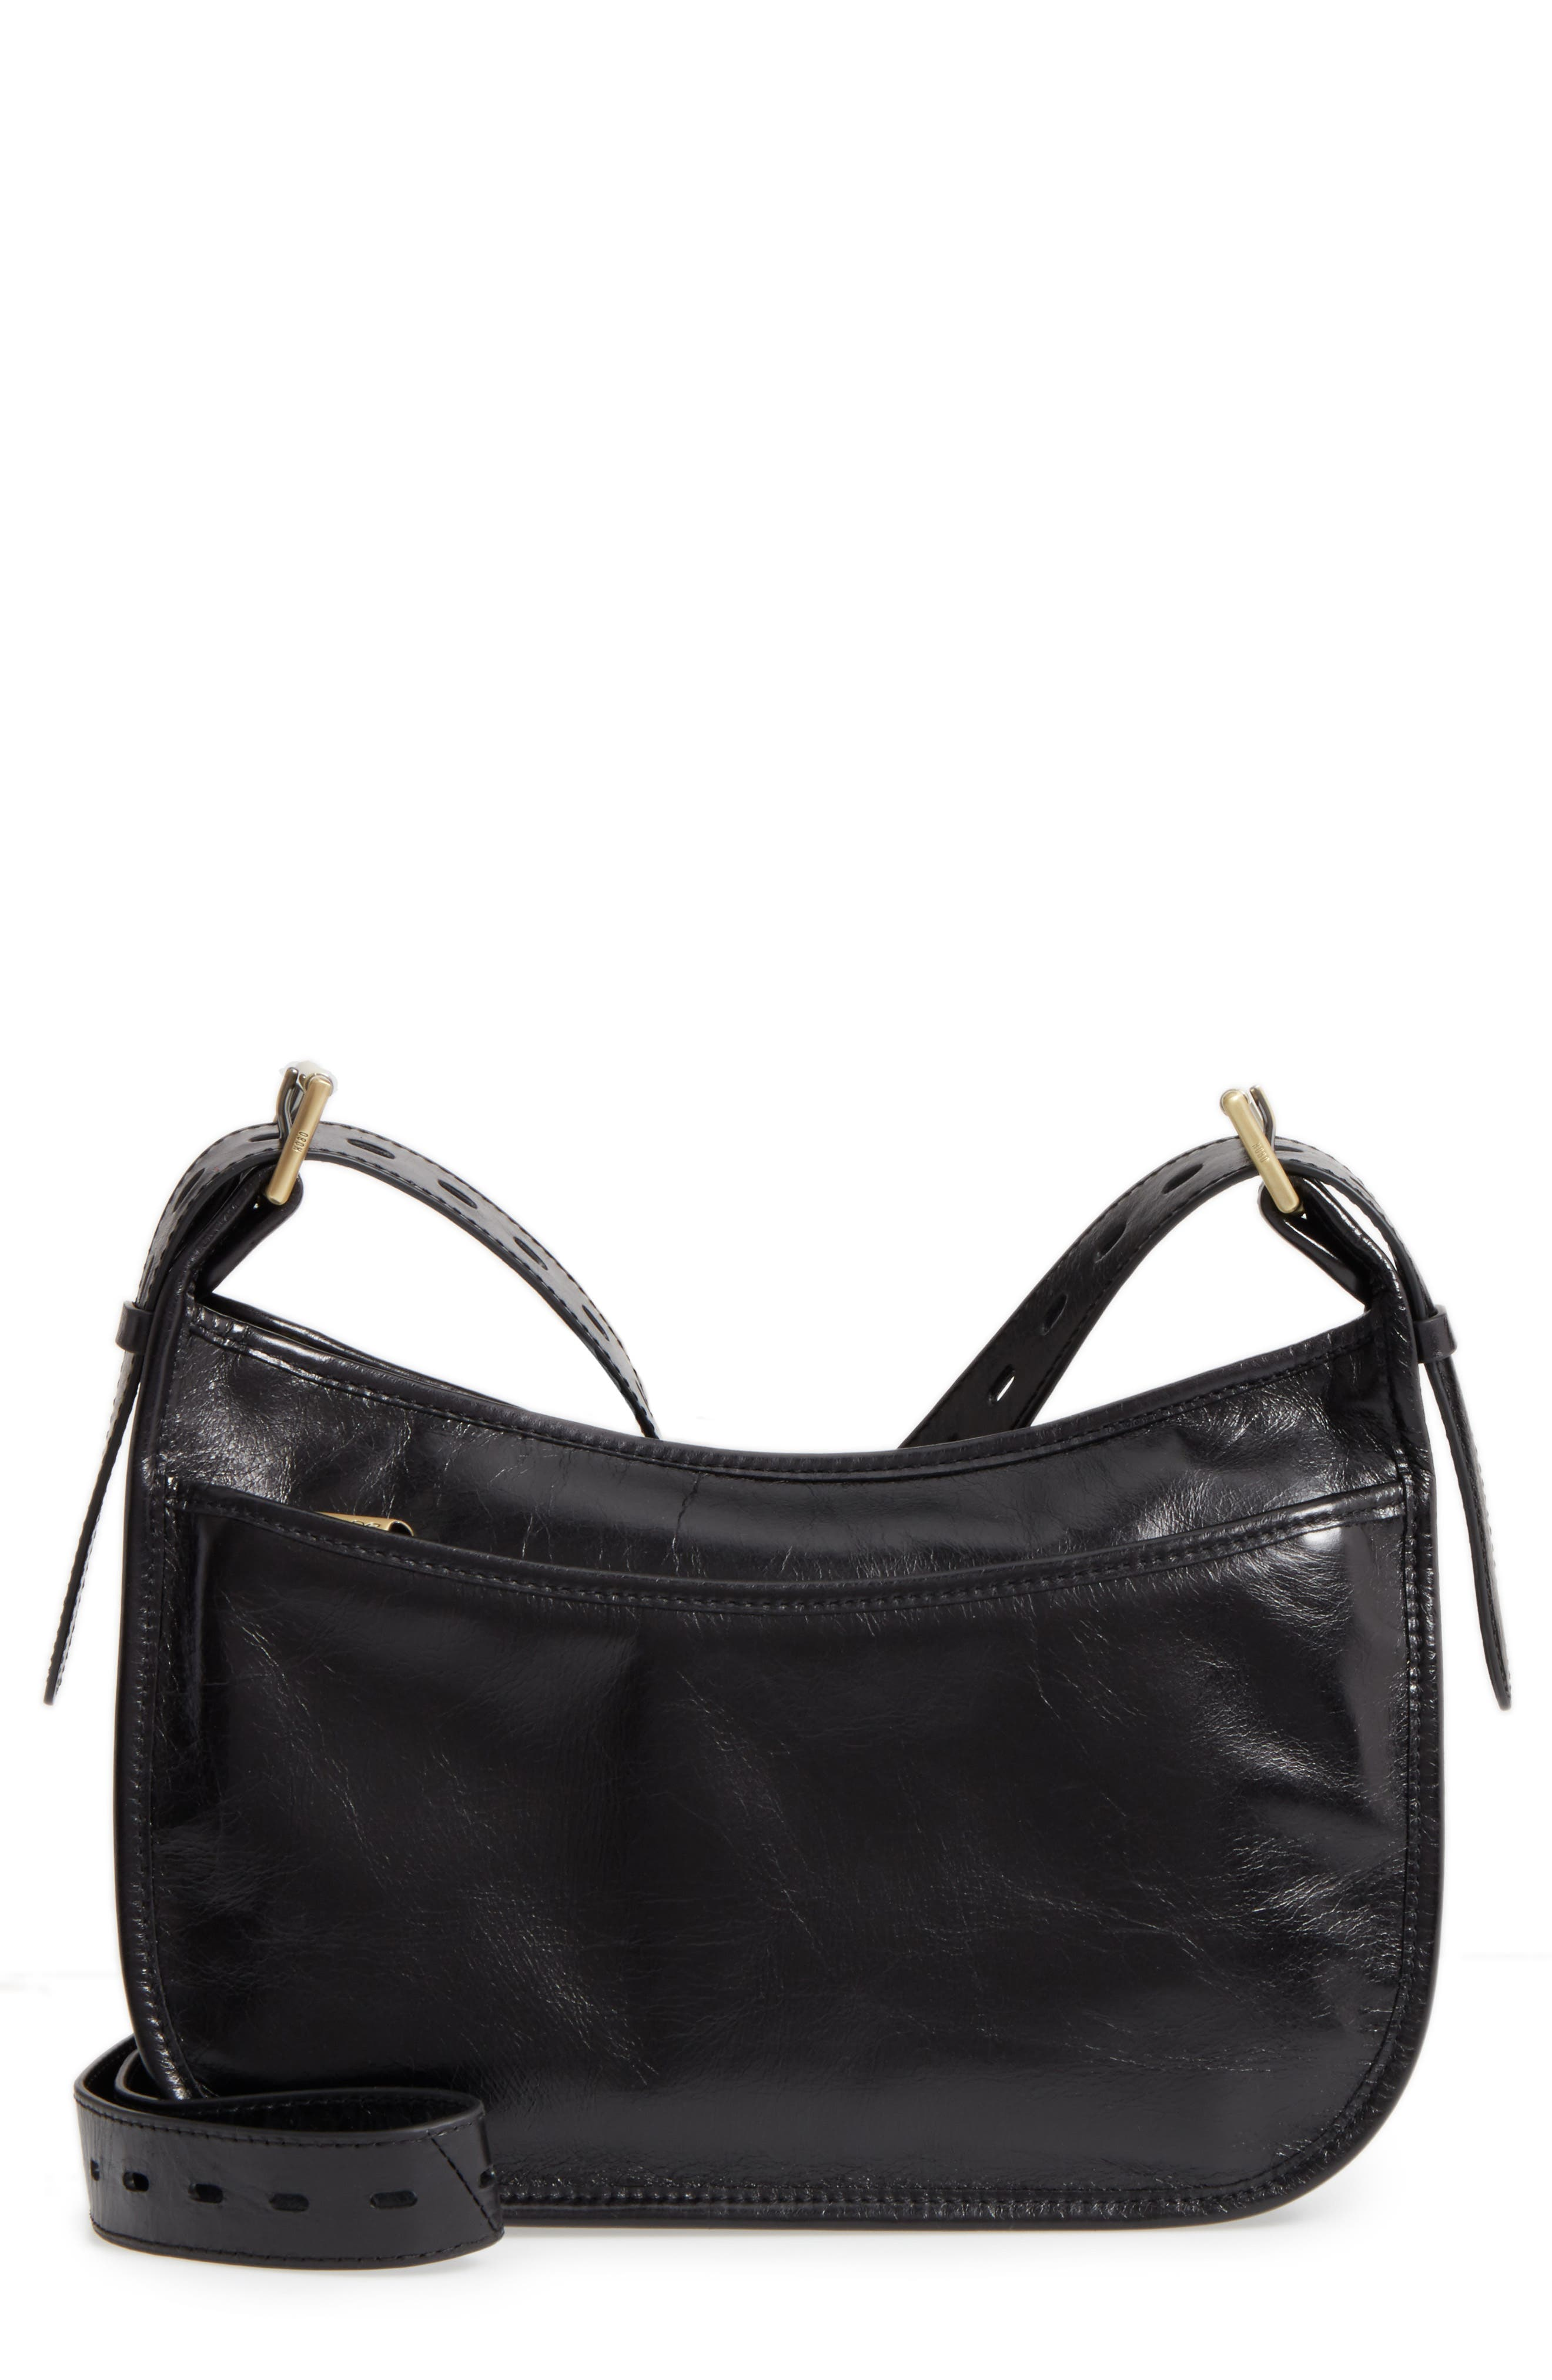 Chase Calfskin Leather Crossbody Bag,                         Main,                         color, Black